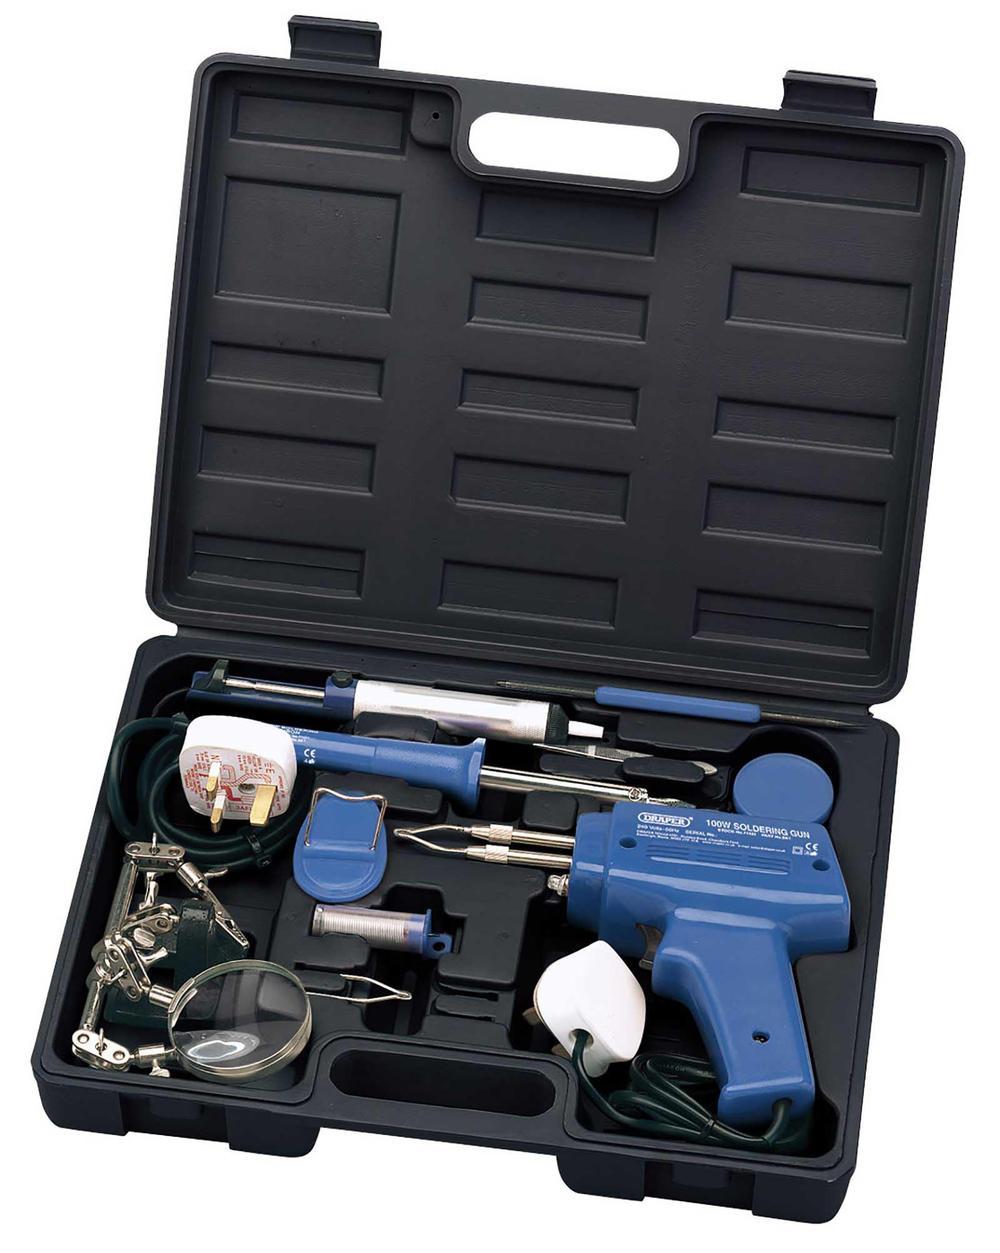 Draper 71421 Sk1 10 Piece Soldering Iron Gun Kit